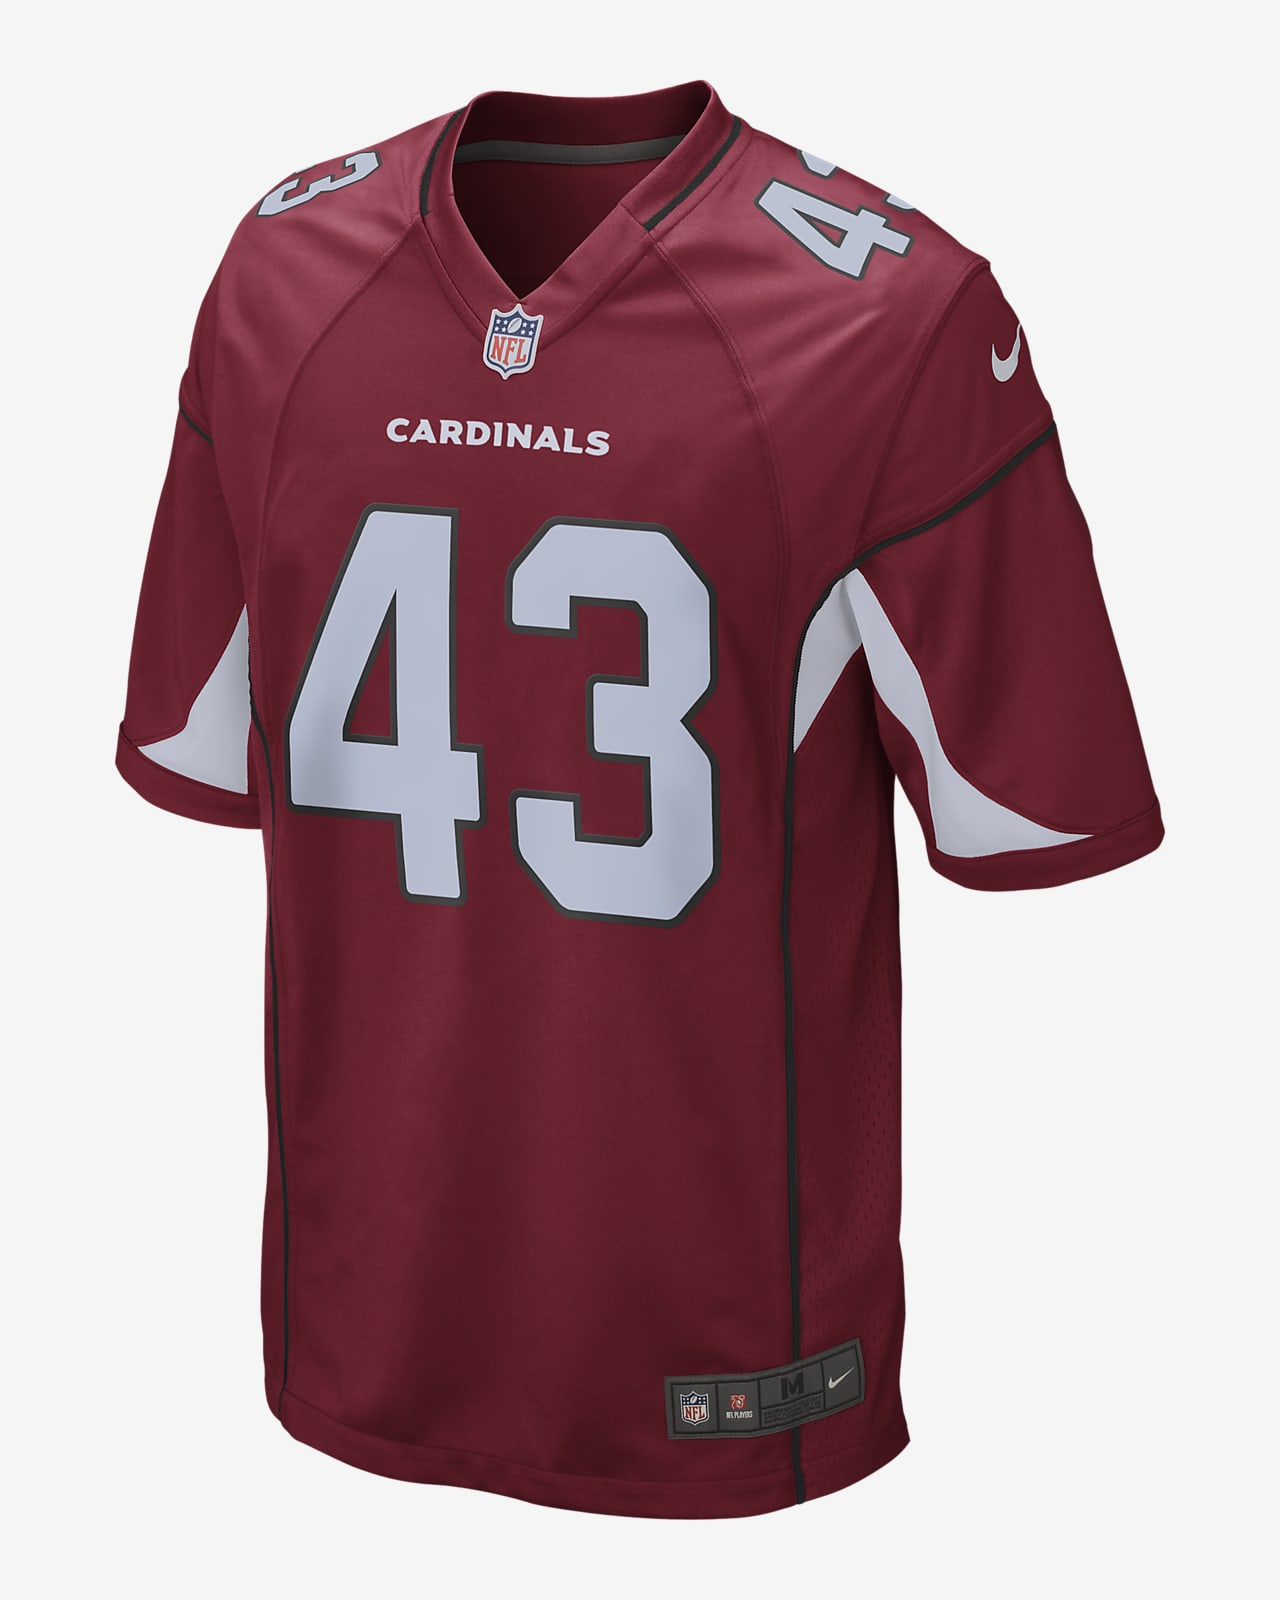 NFL Arizona Cardinals (Haason Reddick) Men's Game Football Jersey